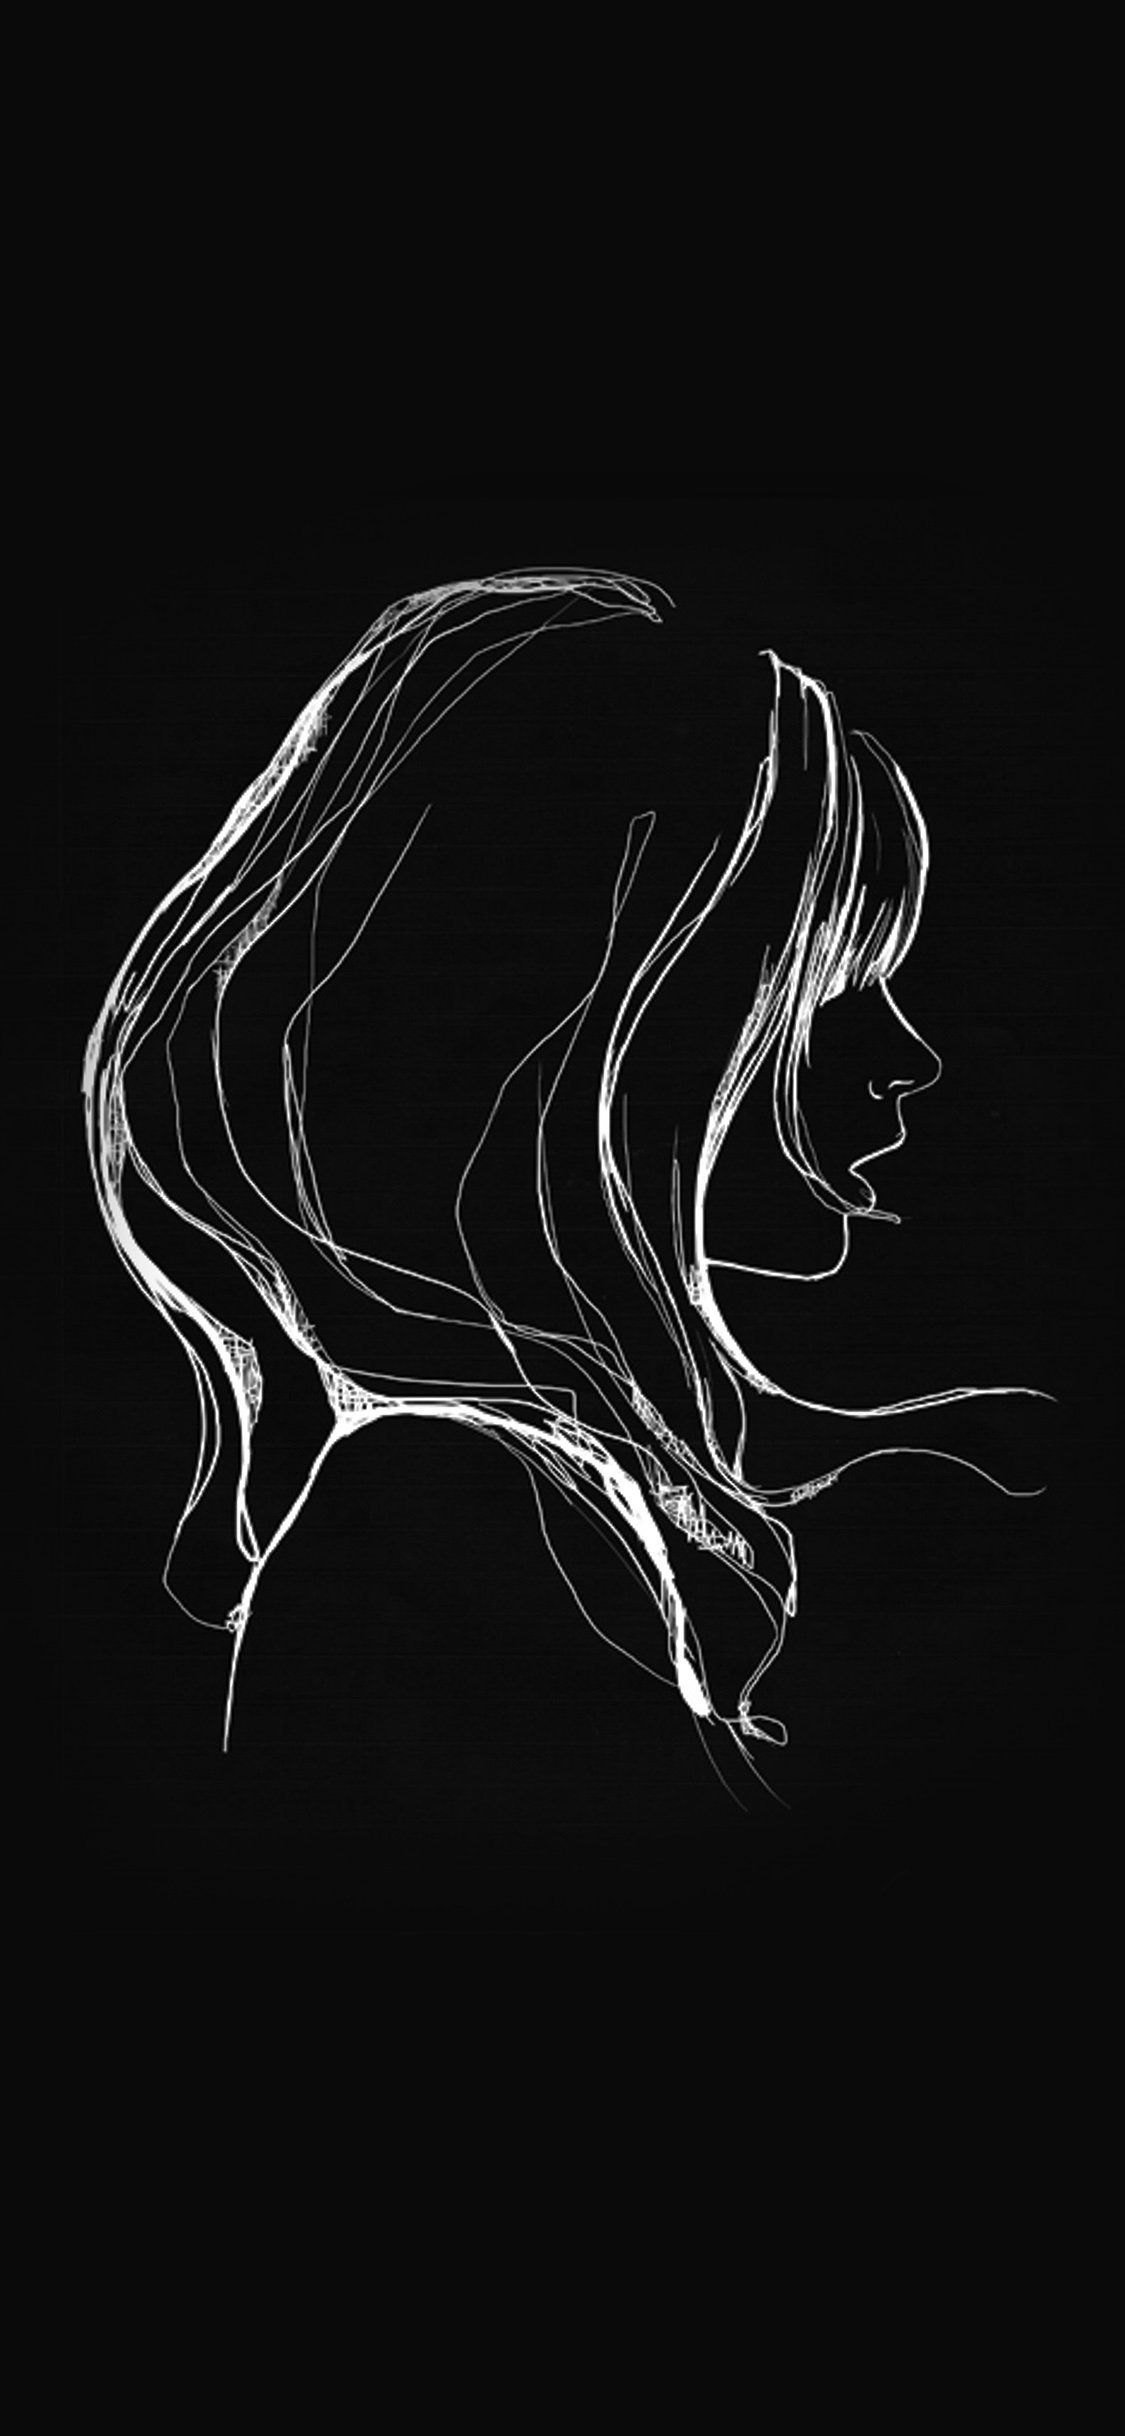 Iphonexpapers Com Apple Iphone Wallpaper Az88 Drawing Simple Minimal Girl Illustration Art Dark Darkiphonewallpaper Dark Wallpaper Iphone Simple Phone Wallpapers Apple Wallpaper Iphone